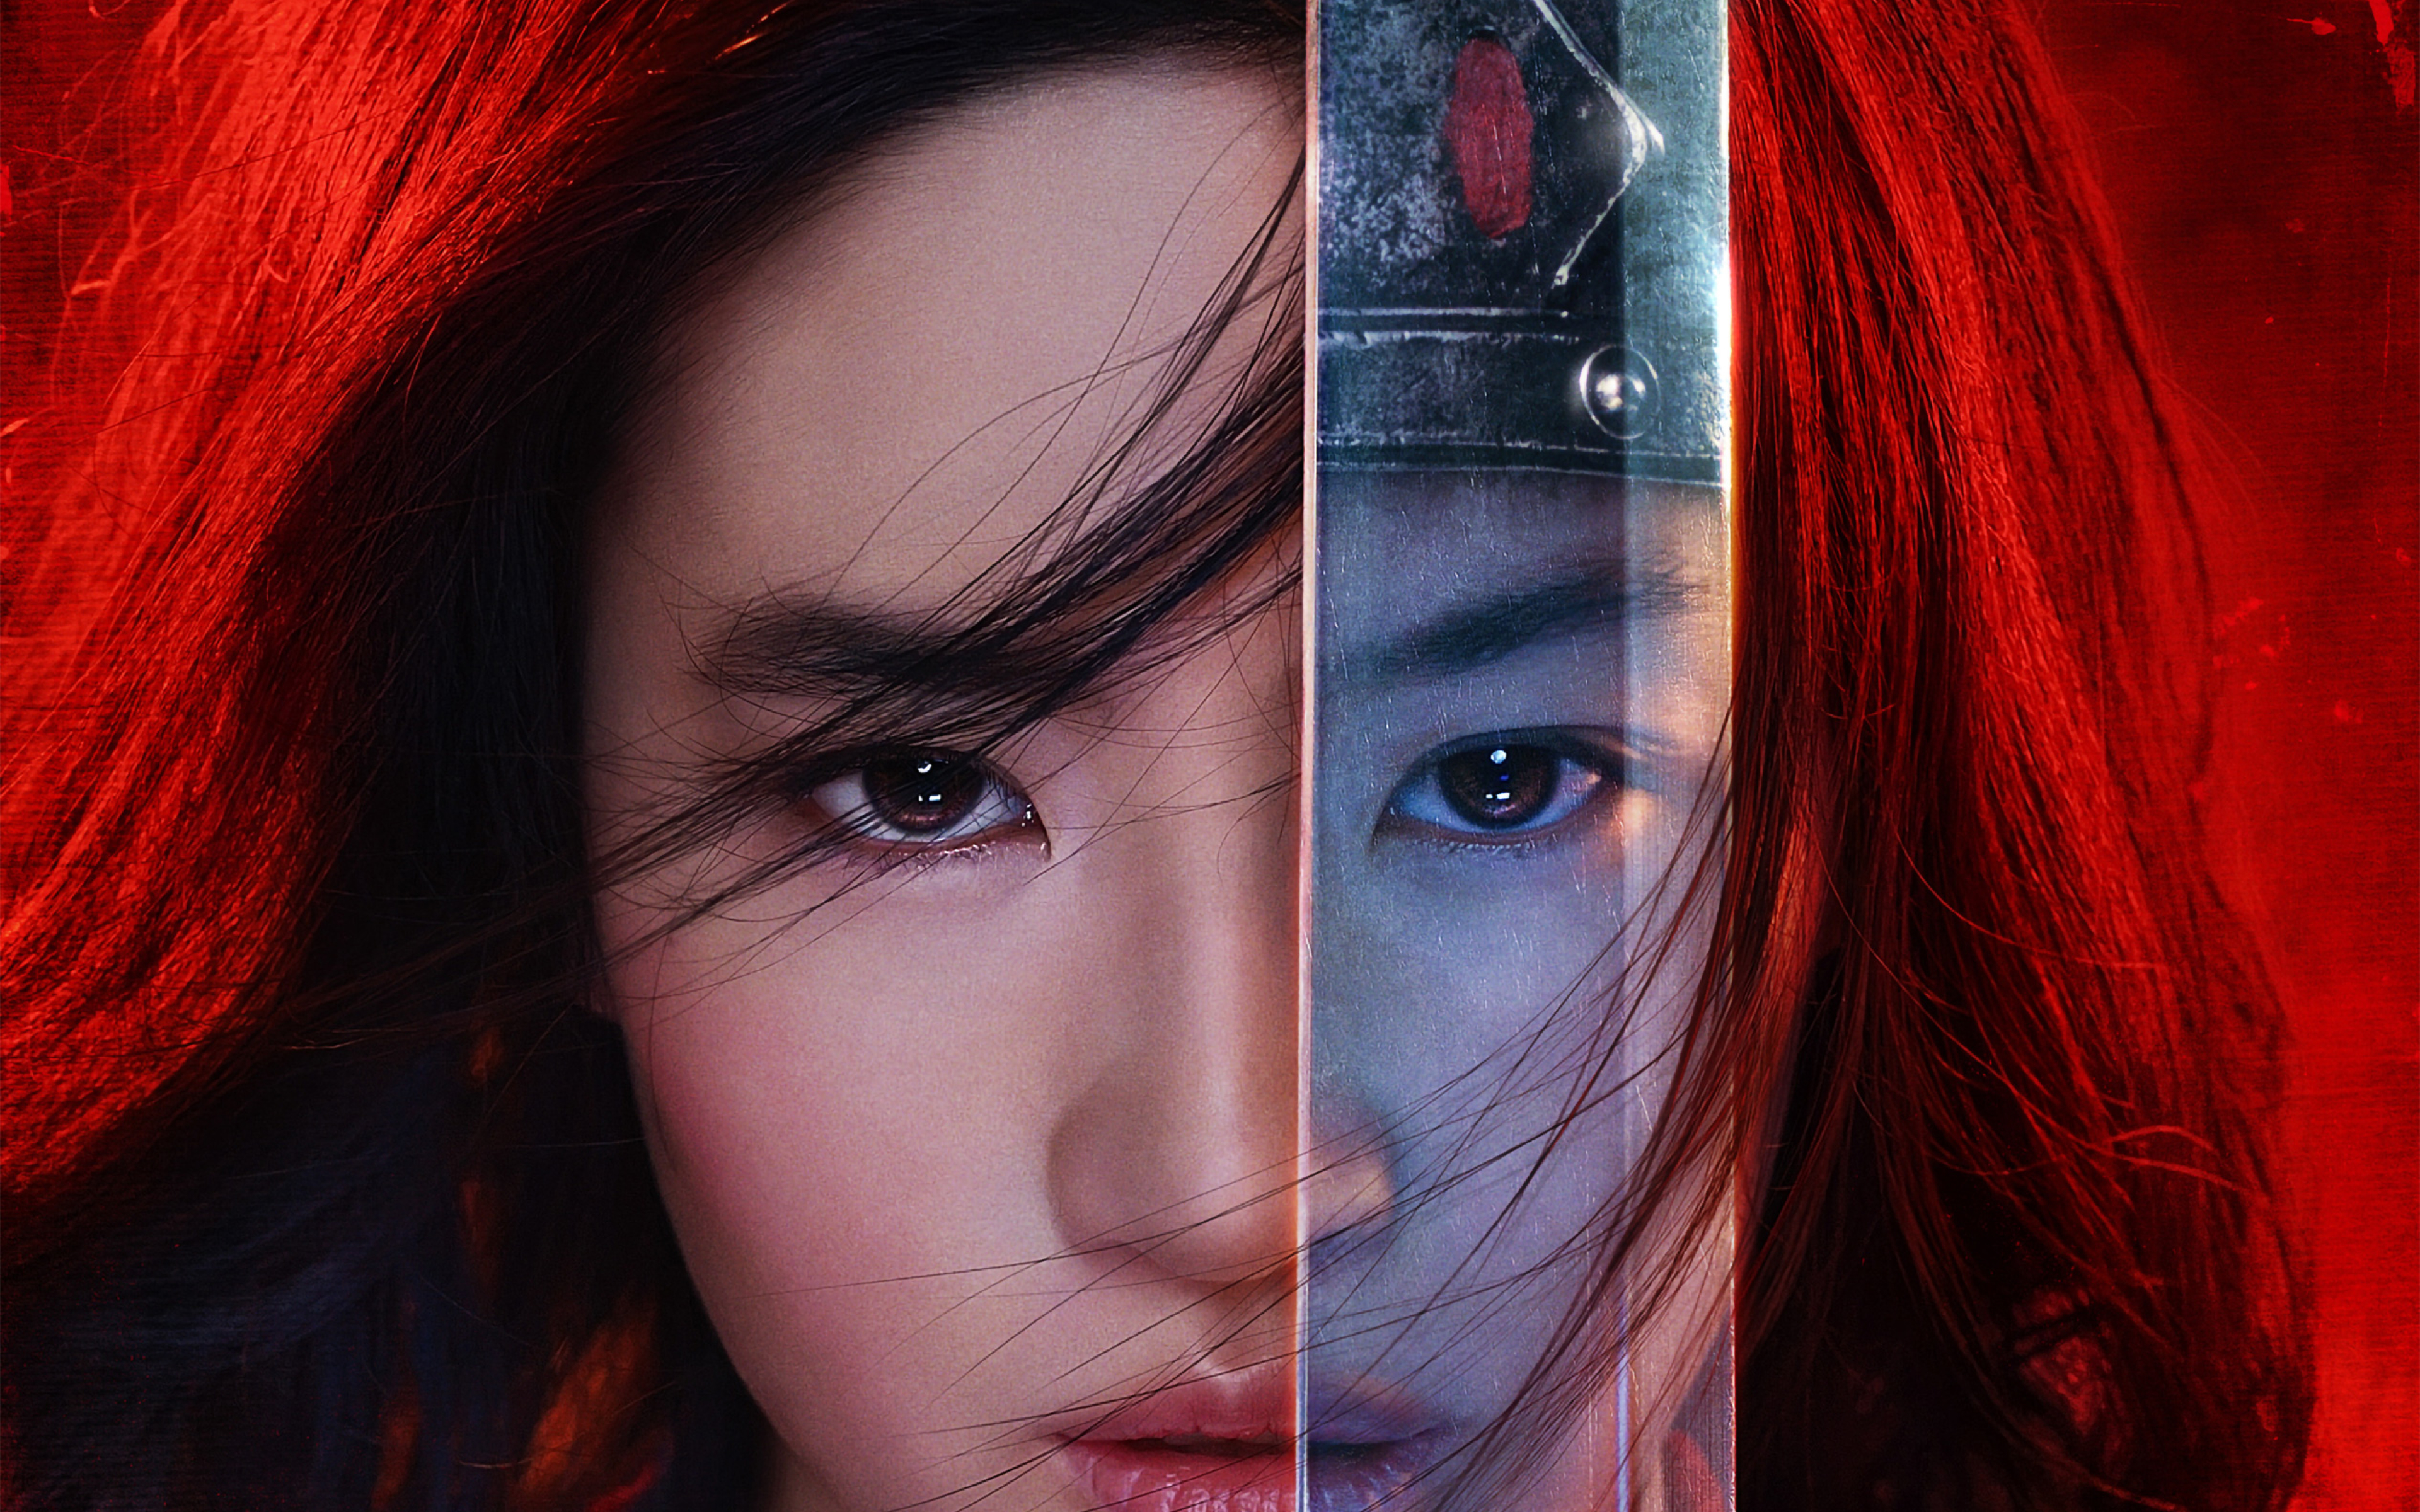 HD Mulan 2020 Movie Poster 38402400   Wallpaper Hook 3840x2400